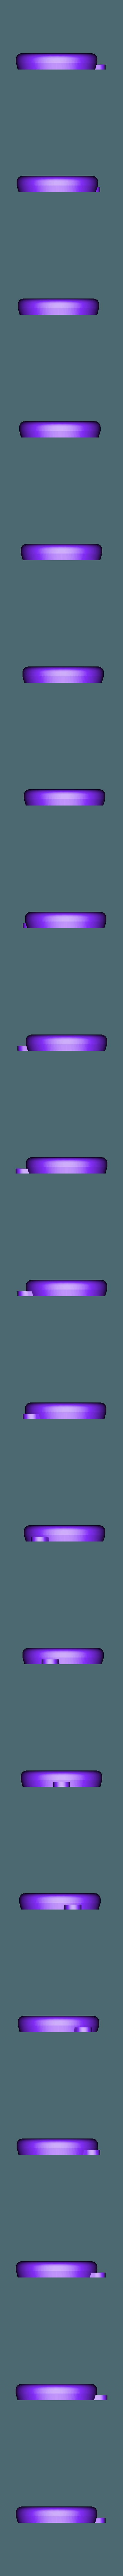 bag_holder_poop_emoji_cap.STL Download free STL file Multi-Color Dog Poop Bag Dispenser • 3D print template, MosaicManufacturing